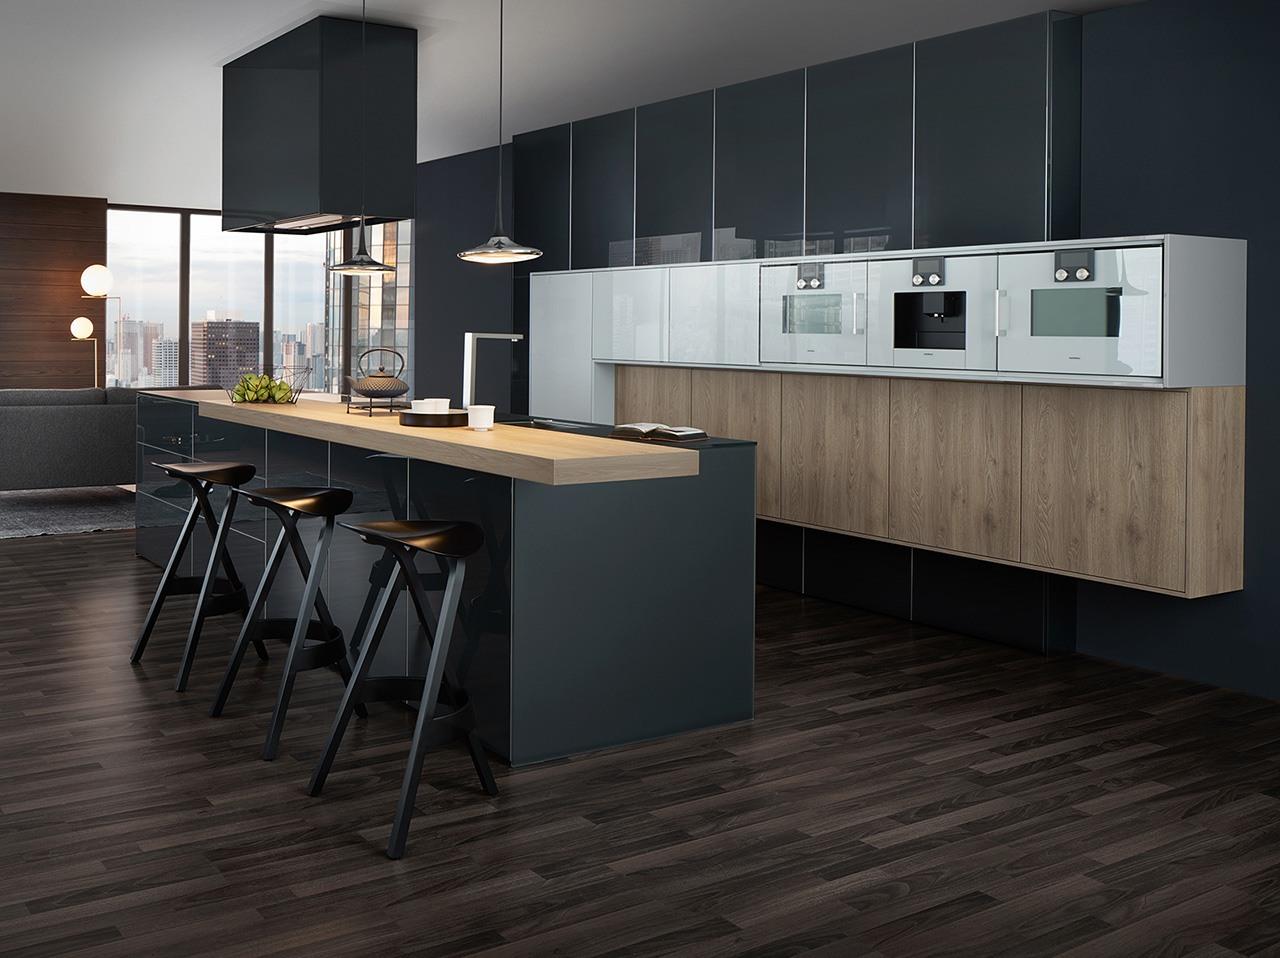 9 Bar Stool Ideas for the Designer Kitchen   Kitchen Magazine